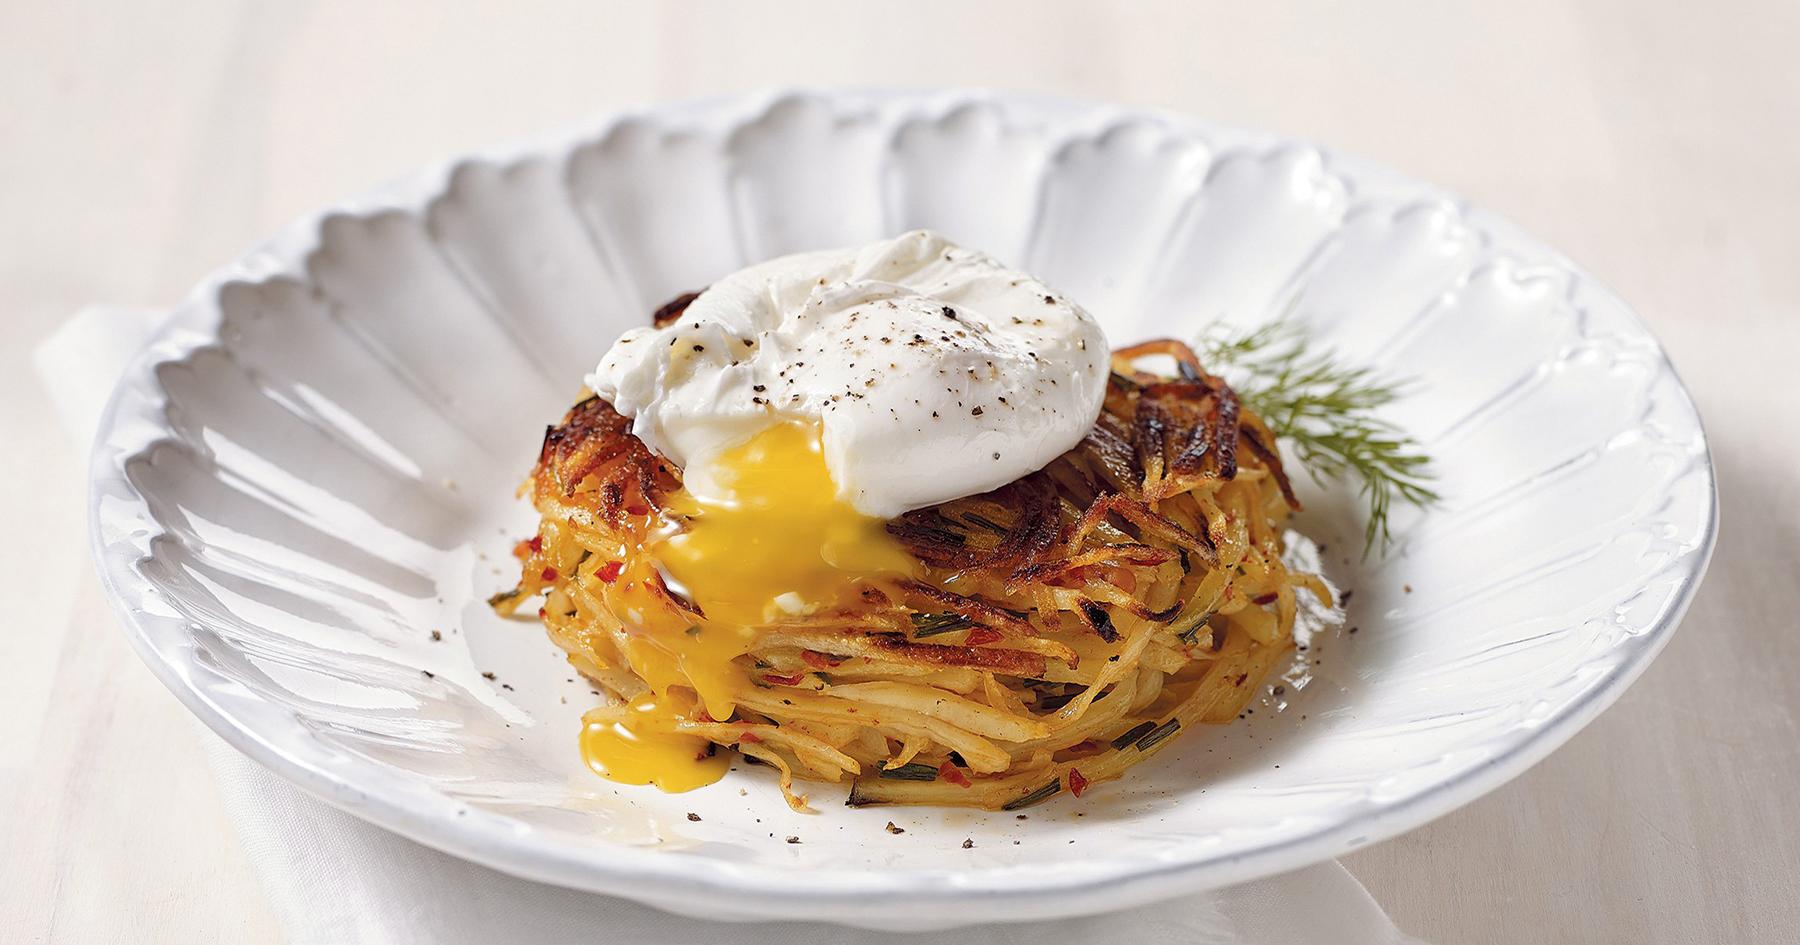 Potato Pancake with Neonata and Poached Egg